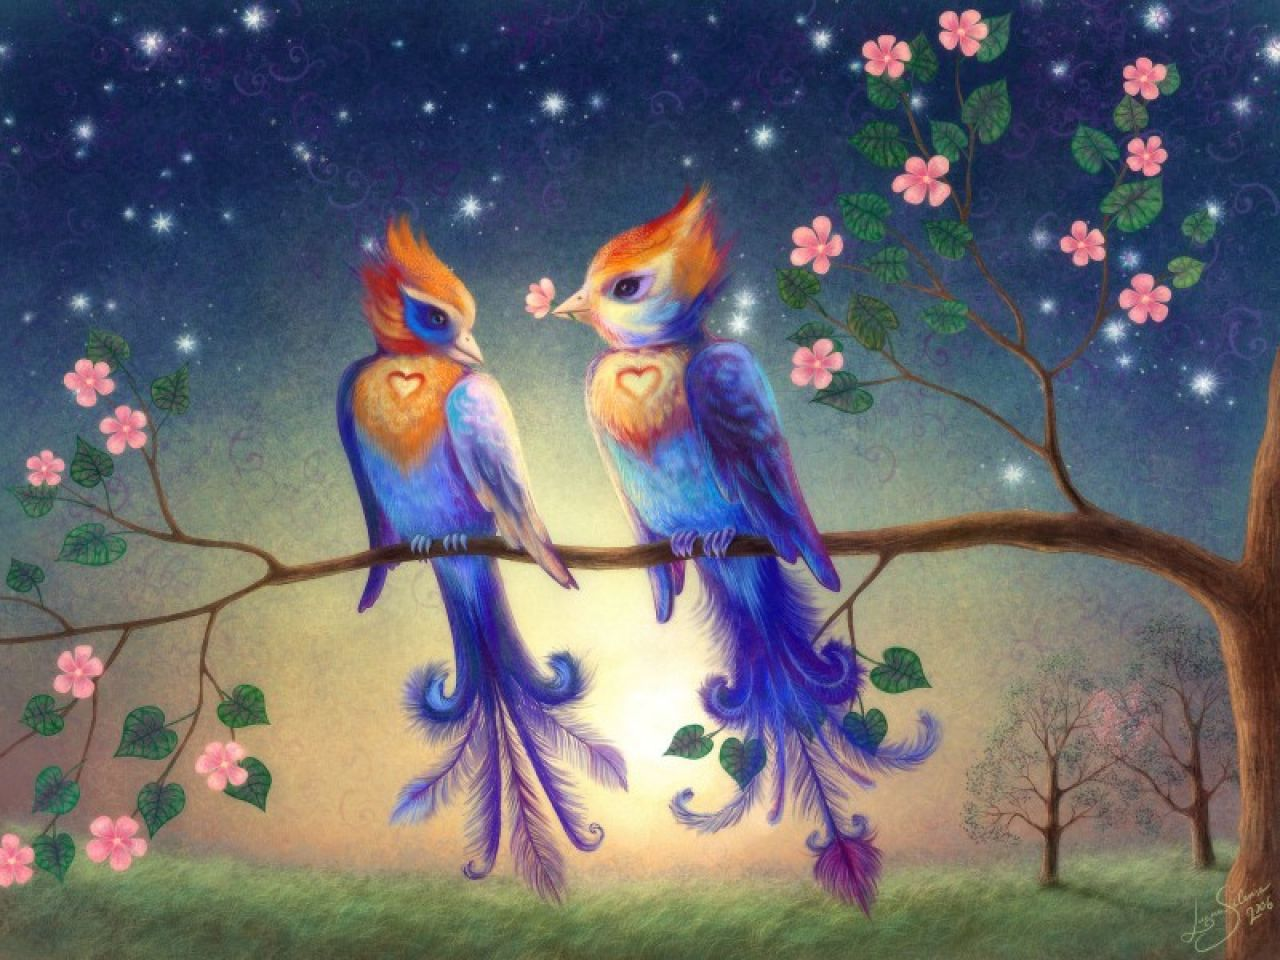 Beautiful Love Hd Wallpapers Free Download In 1080p: Fondos De Fantasia – Animales Fantásticos